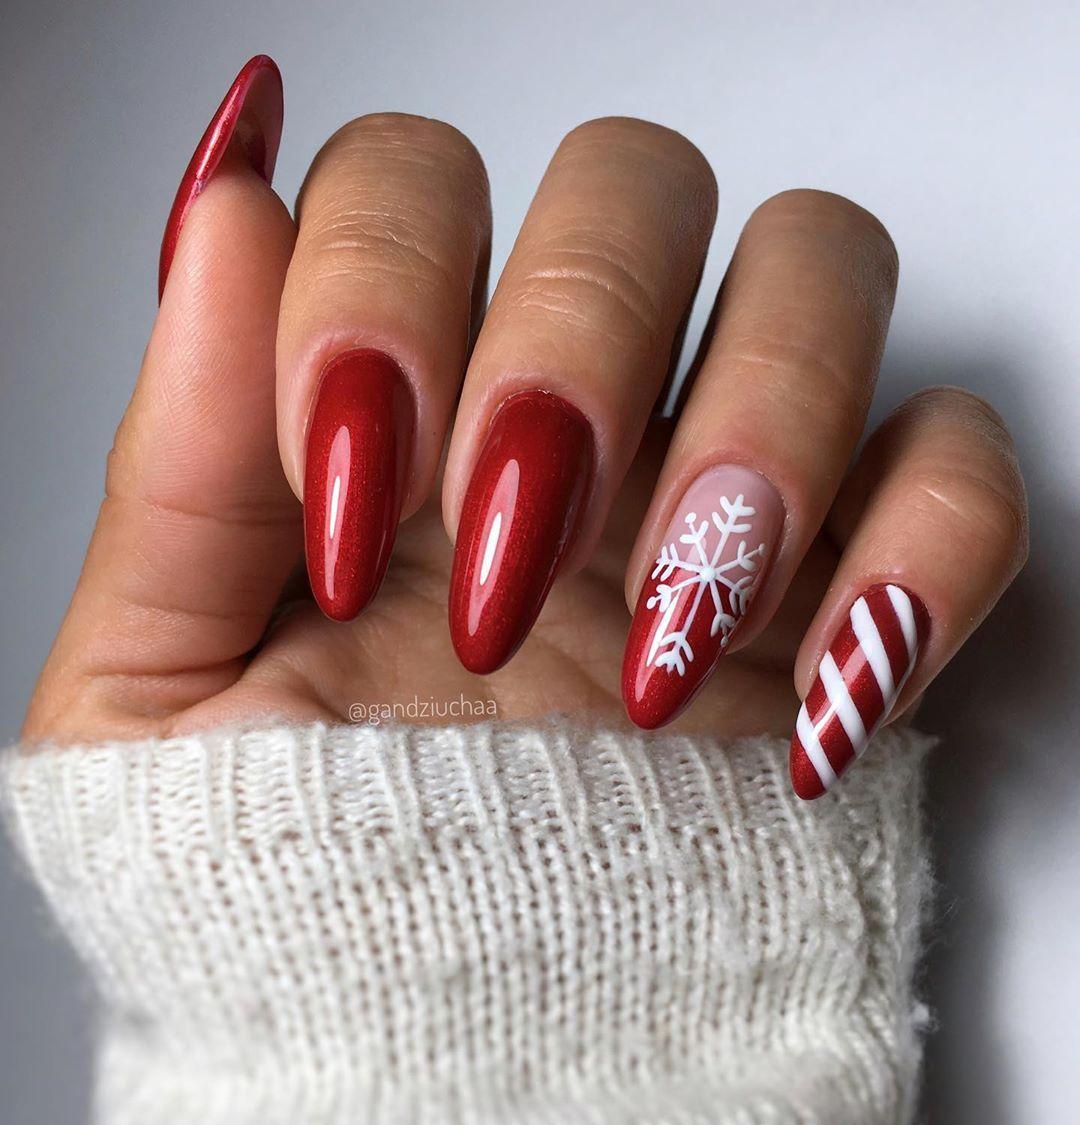 Indigo Designer On Instagram Nails Mani Hybridnails Indigonails Indigodesigner Christmasnails Winternails Nailart Rednails Nailsinsp Nail Art Nails Mani